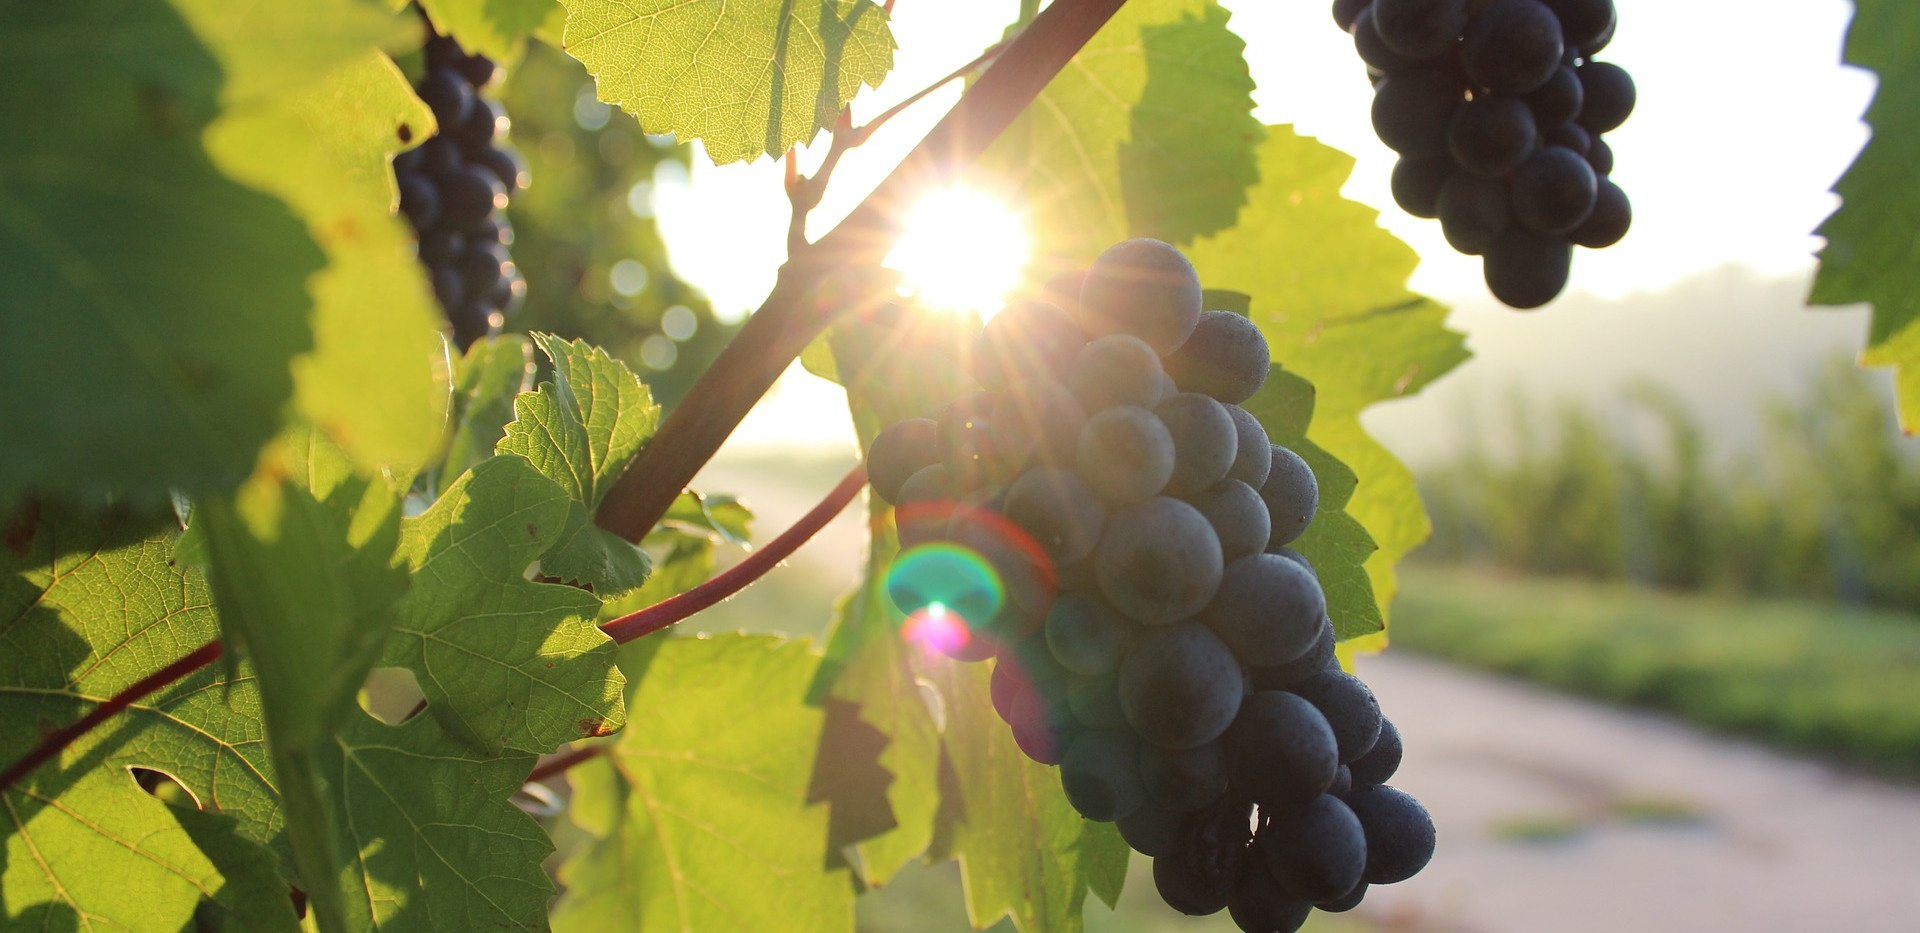 grapes-984493_1920.jpg